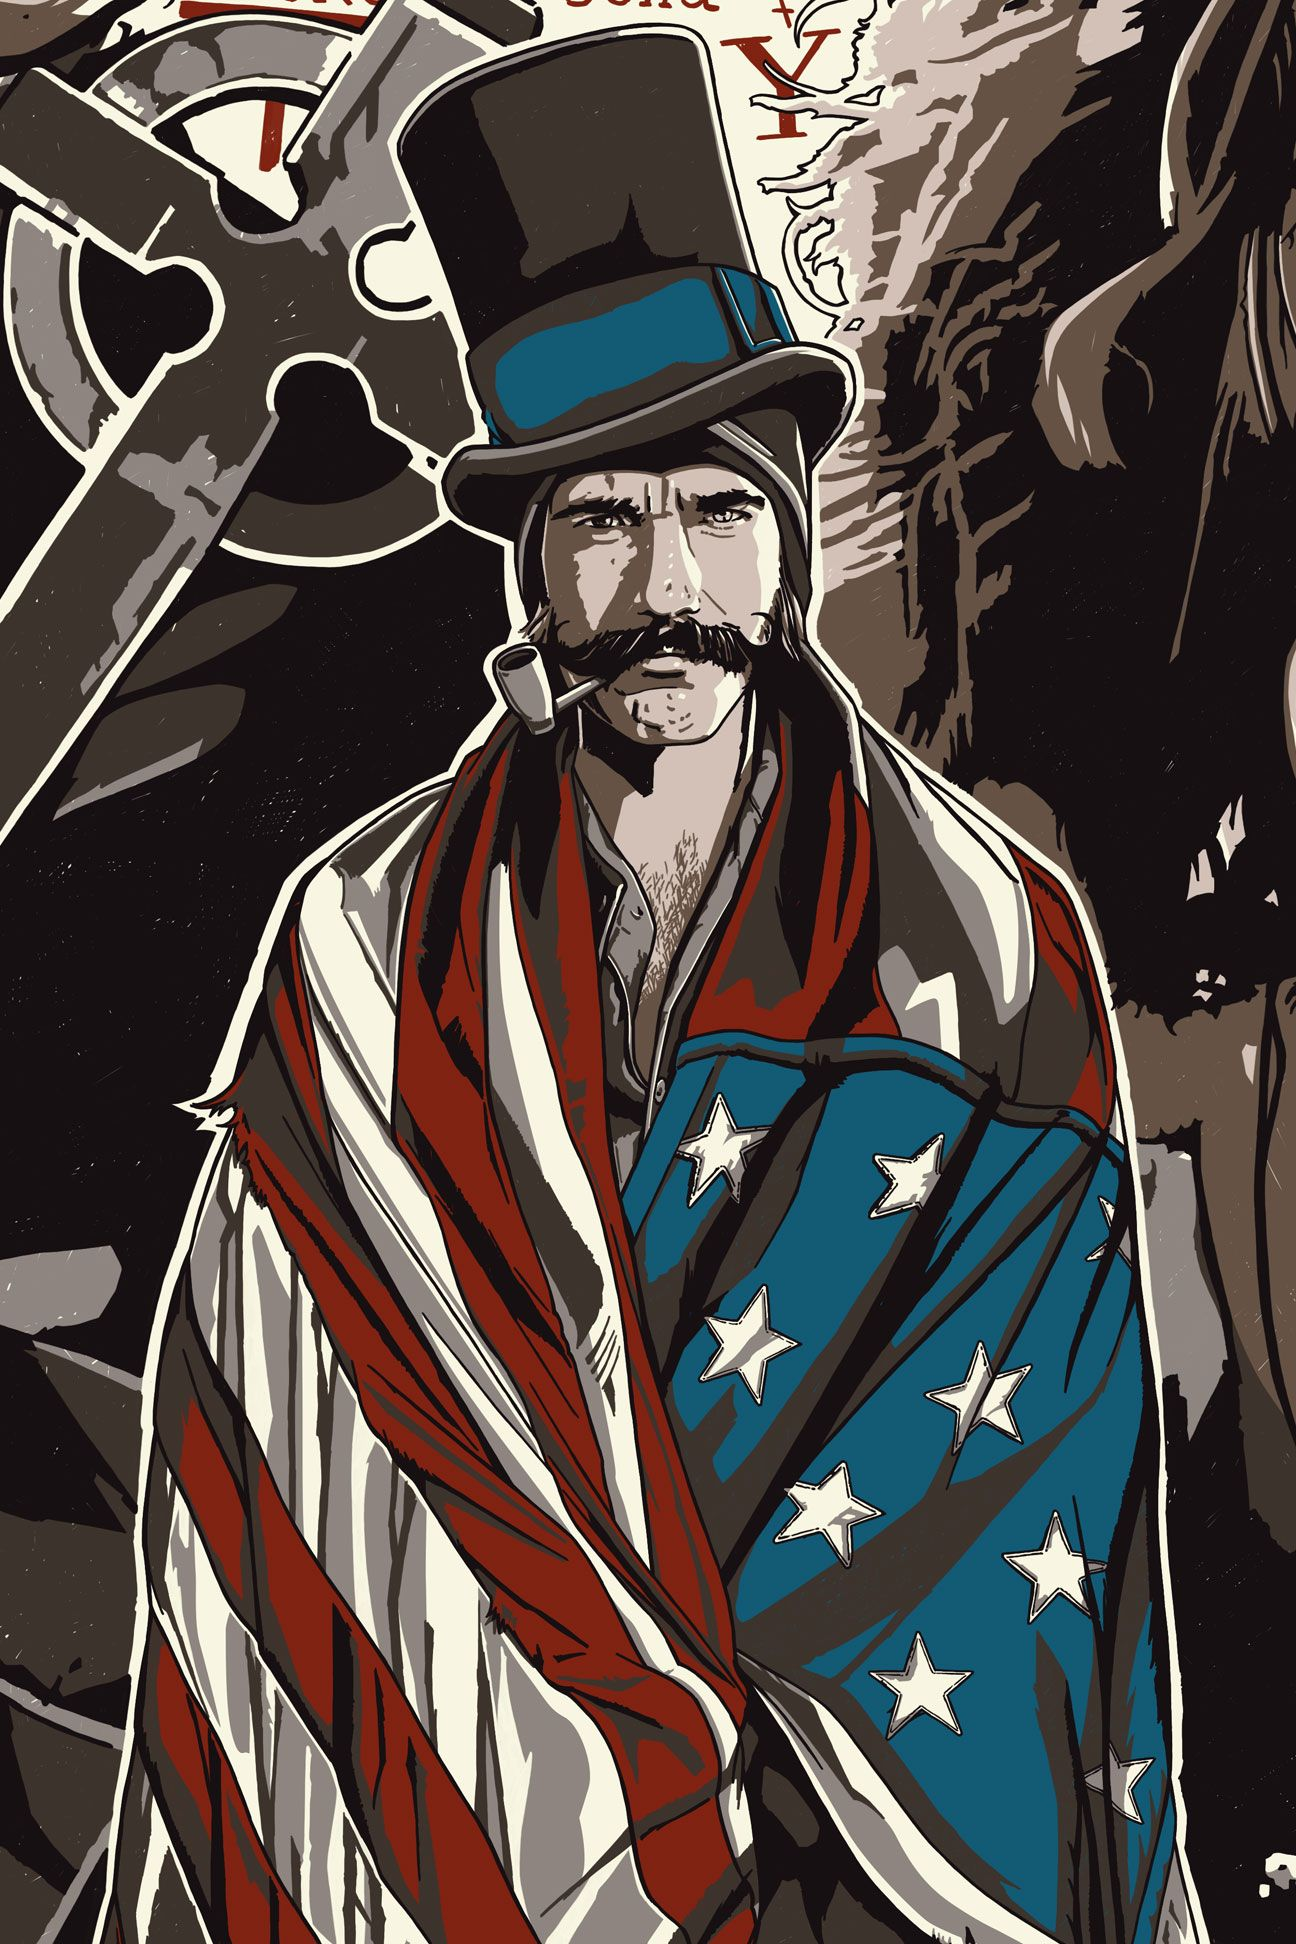 Bill The Butcher Gangs Of New York Movie Poster Art Movie Art